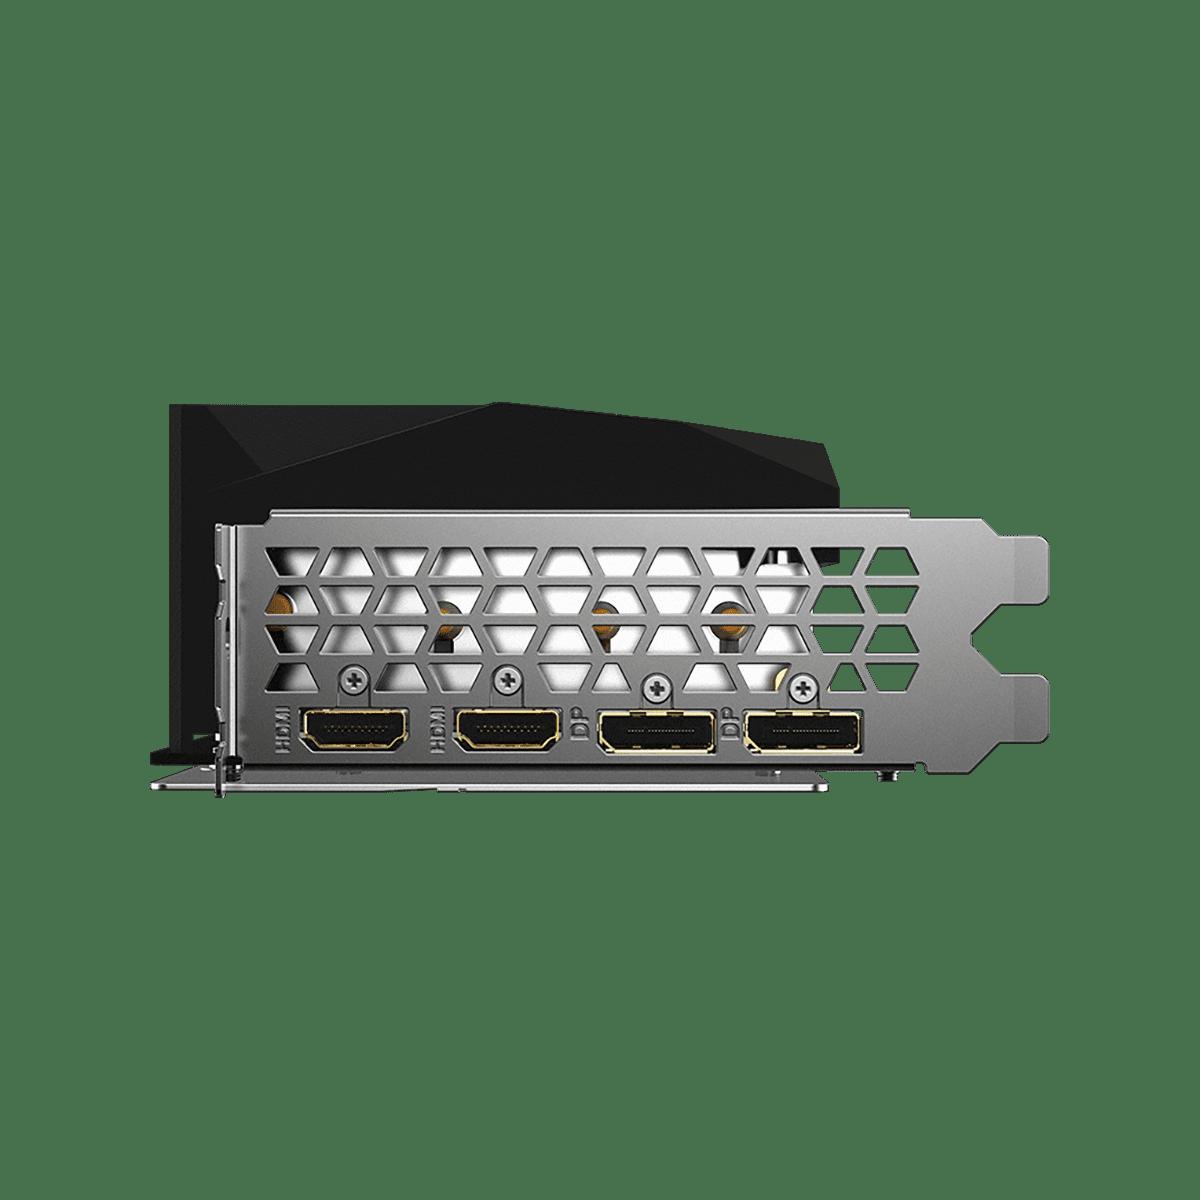 GV-R68XTGAMING OC-16GD